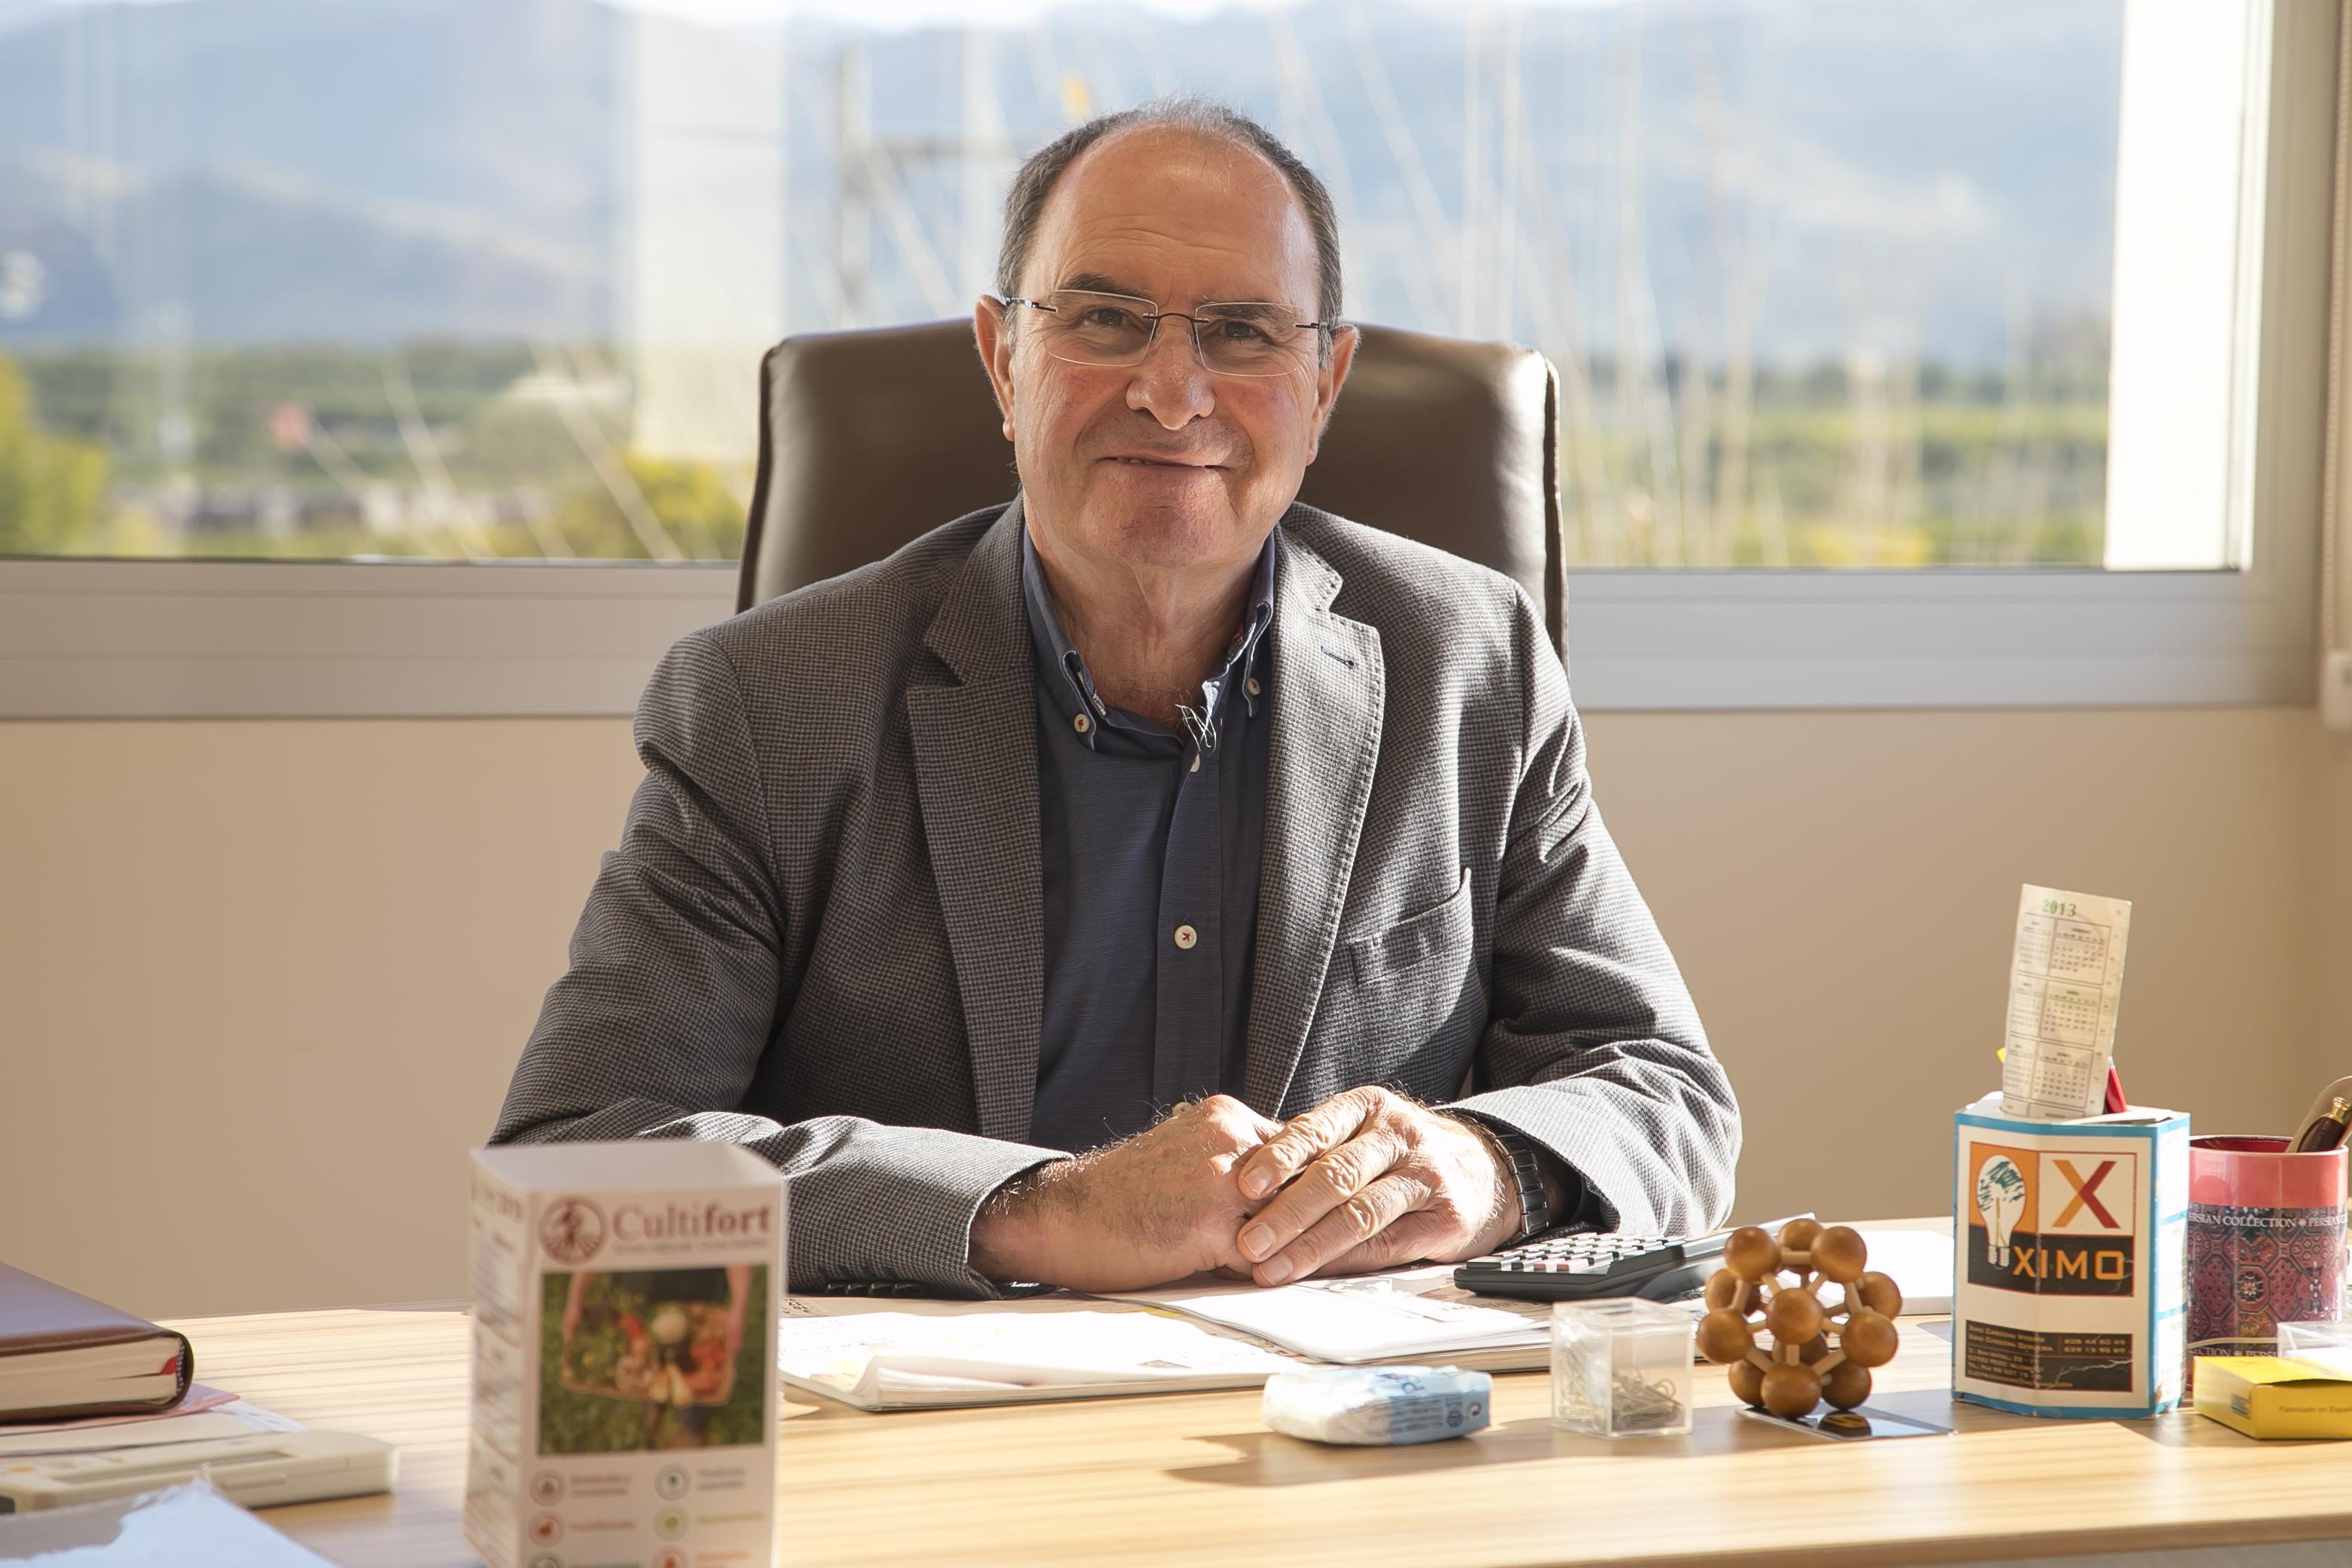 Rafael Sendra, Fundador Cultifort